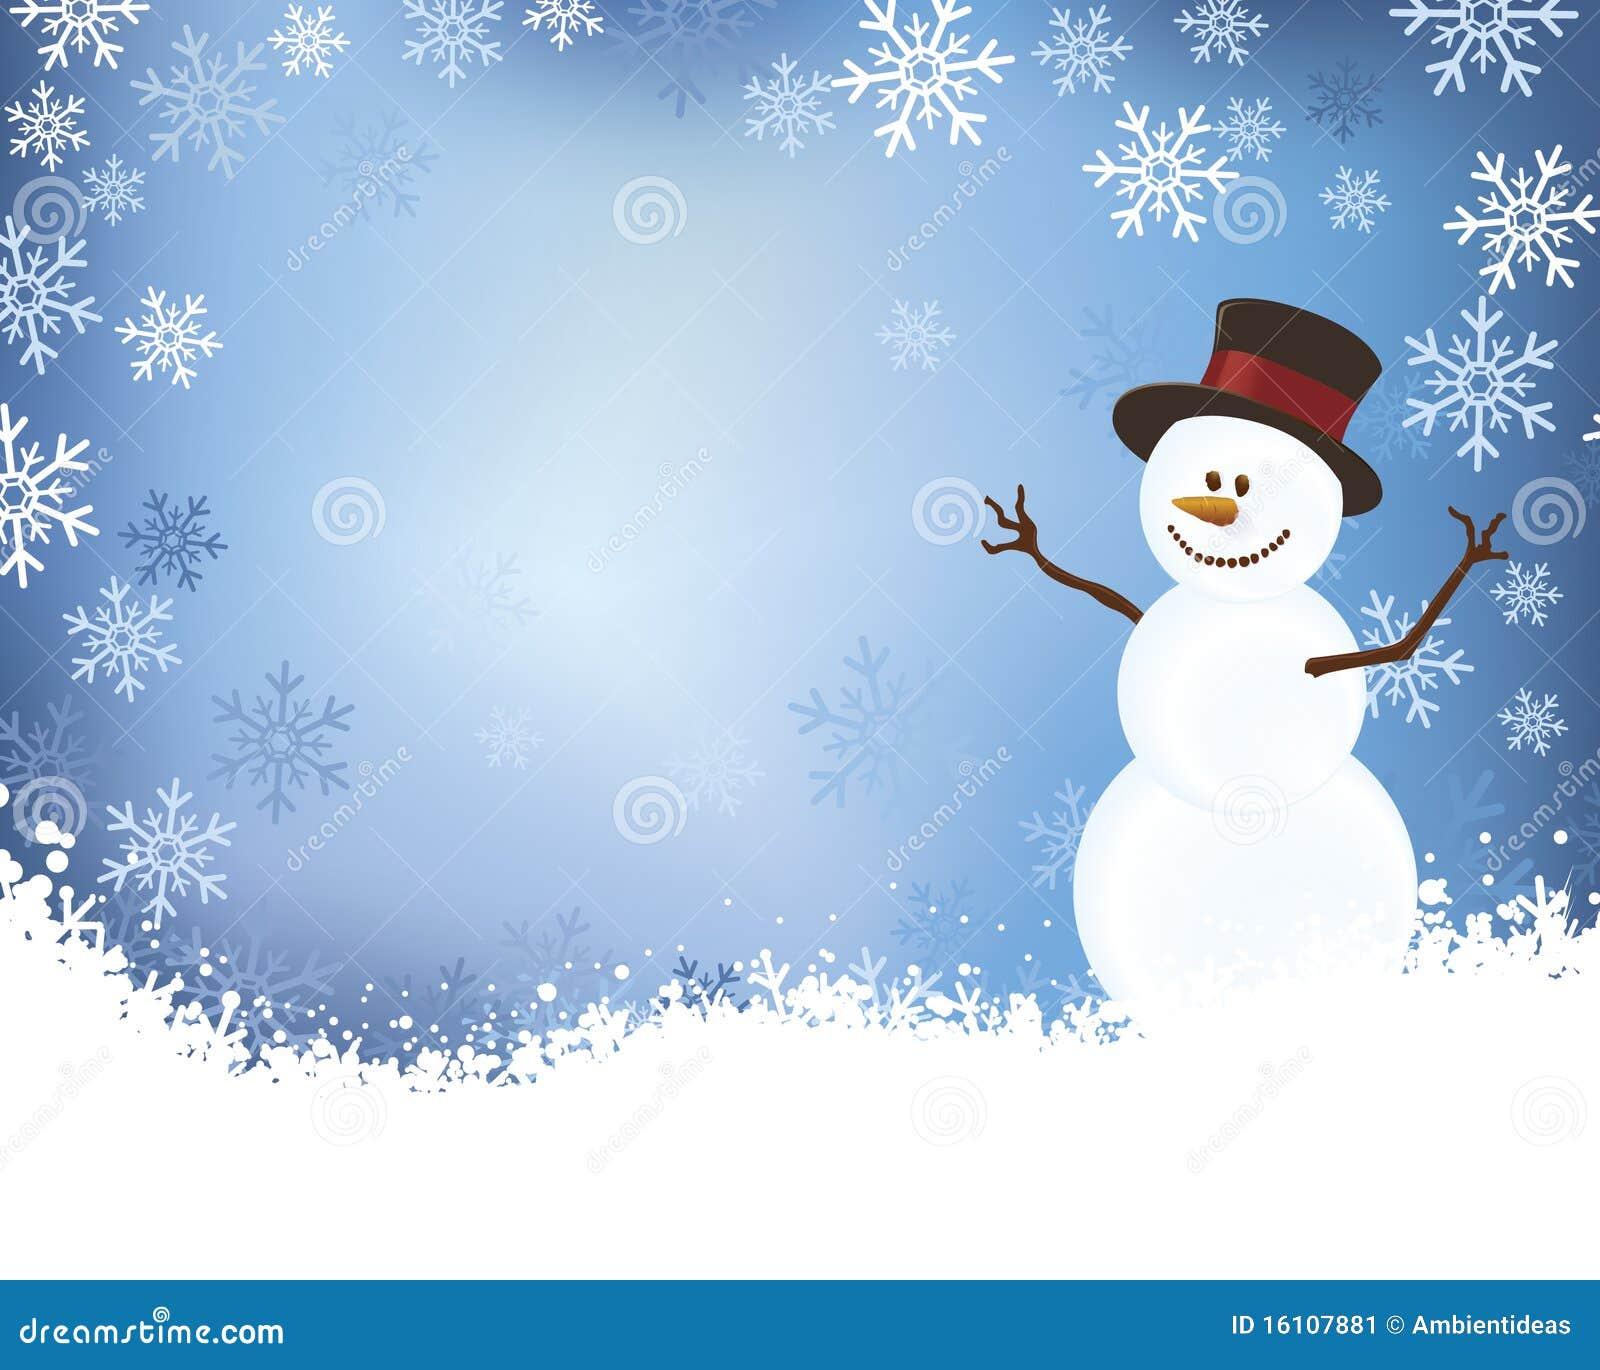 Snowman On Blue Winter Scene Background Stock Illustration